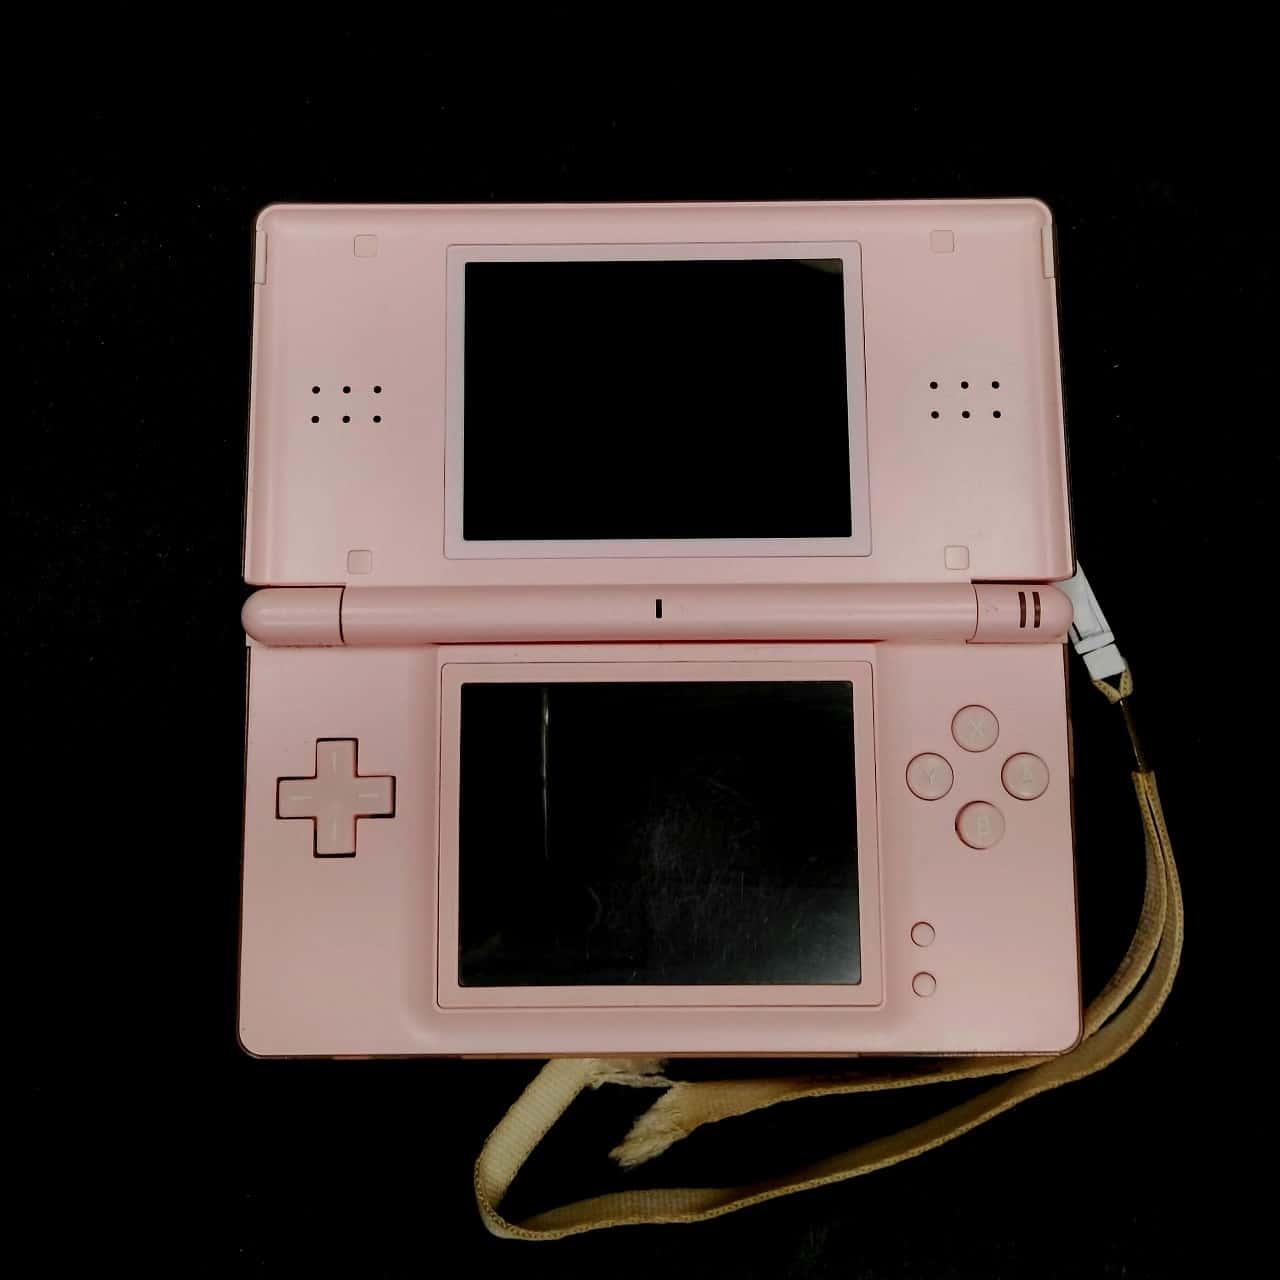 Nintendo DS lite Pink Handheld Gaming Console